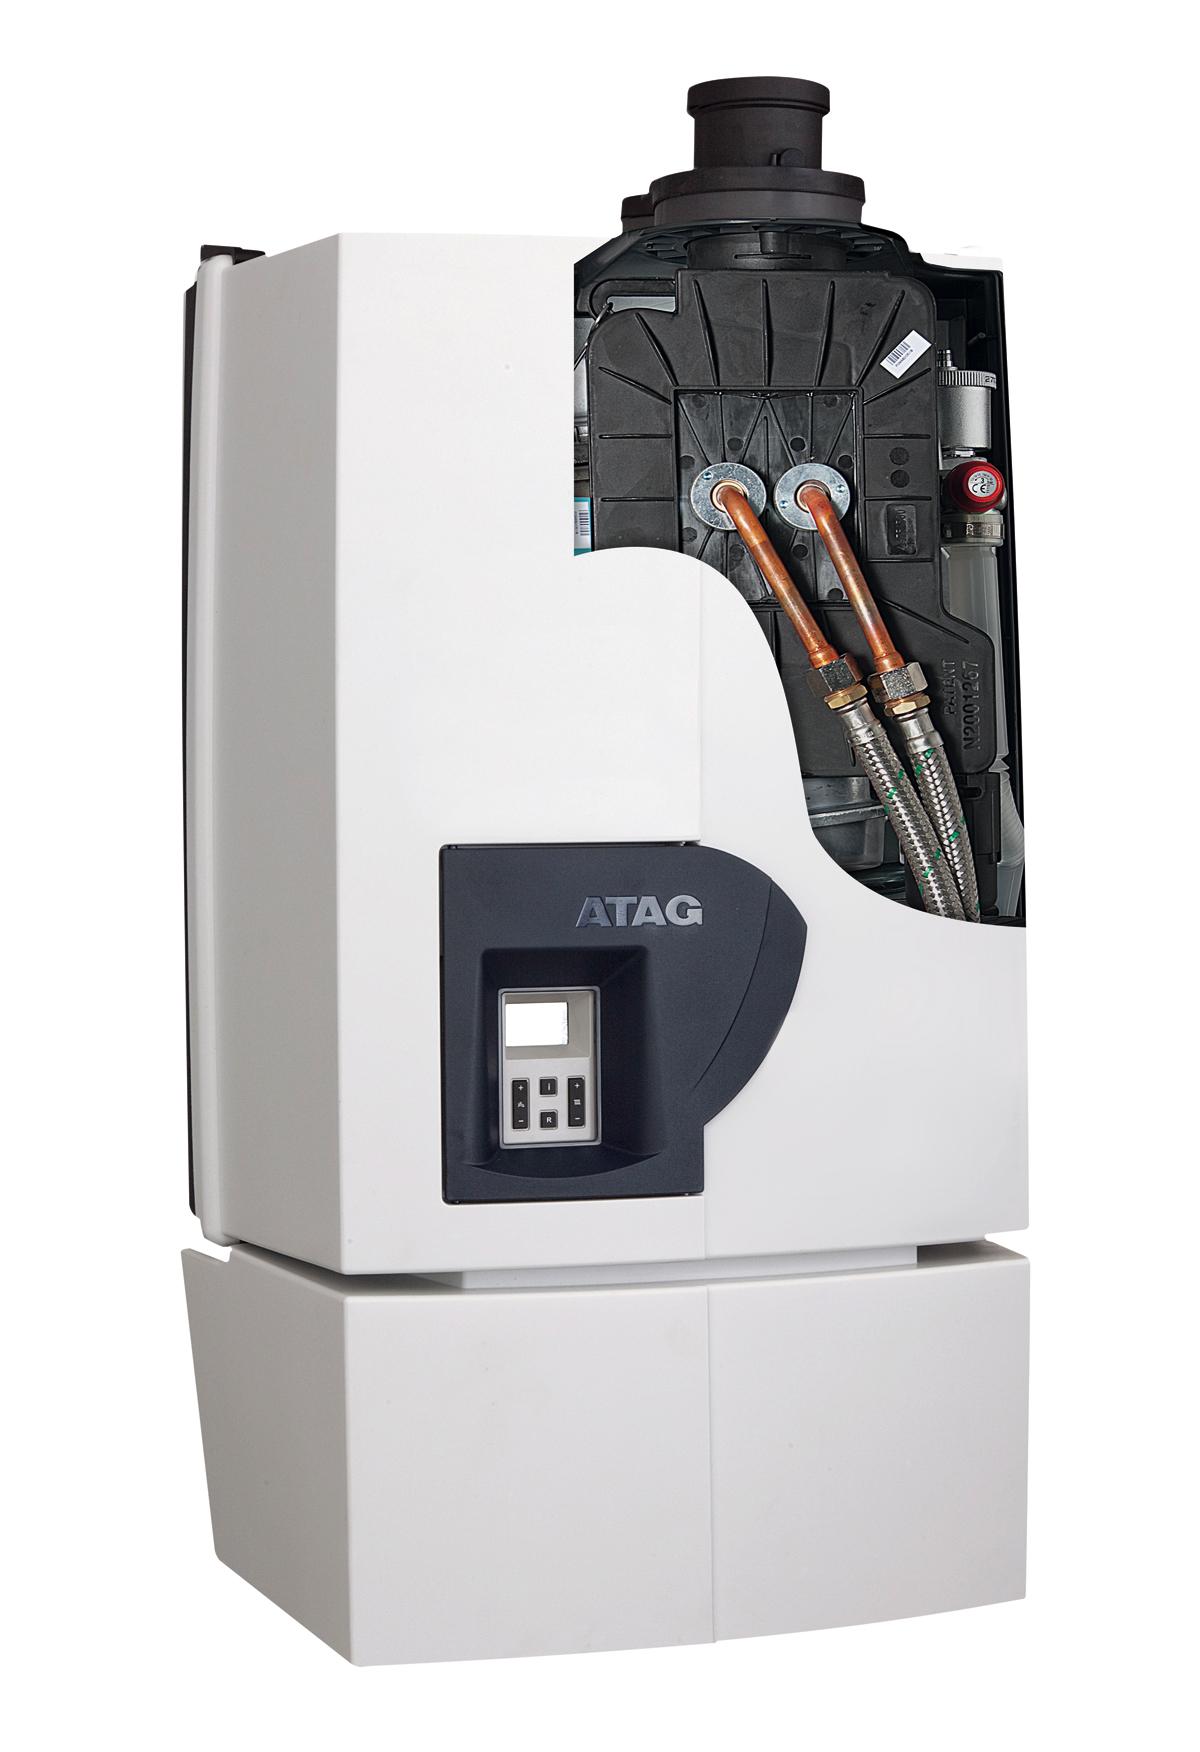 Atag a serie eco caldaia a condensazione for Temperatura acqua caldaia termosifoni